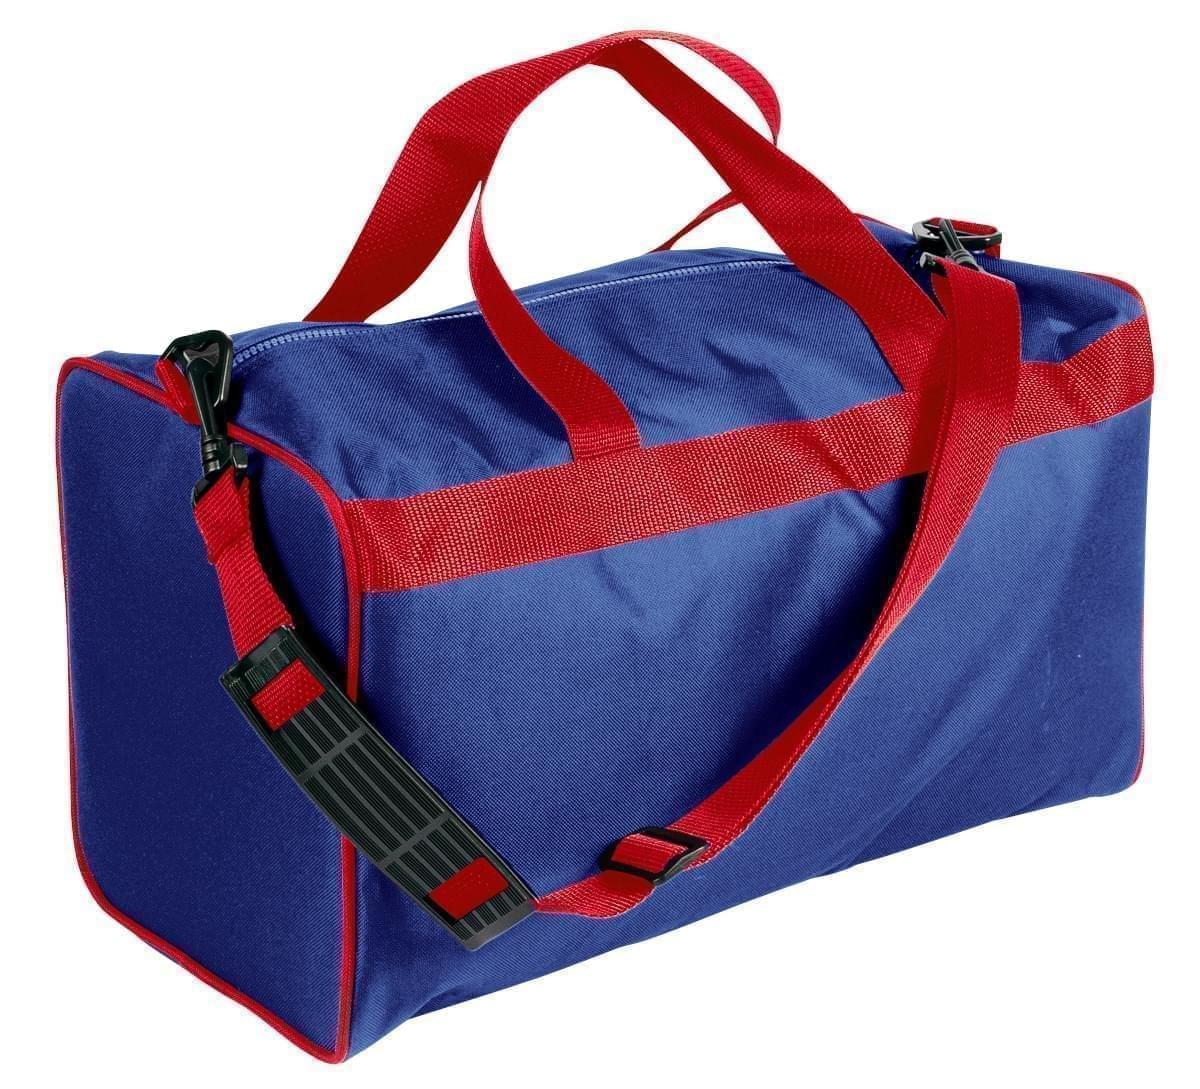 USA Made Nylon Poly Weekend Duffles, Royal Blue-Red, WLKX31AA02